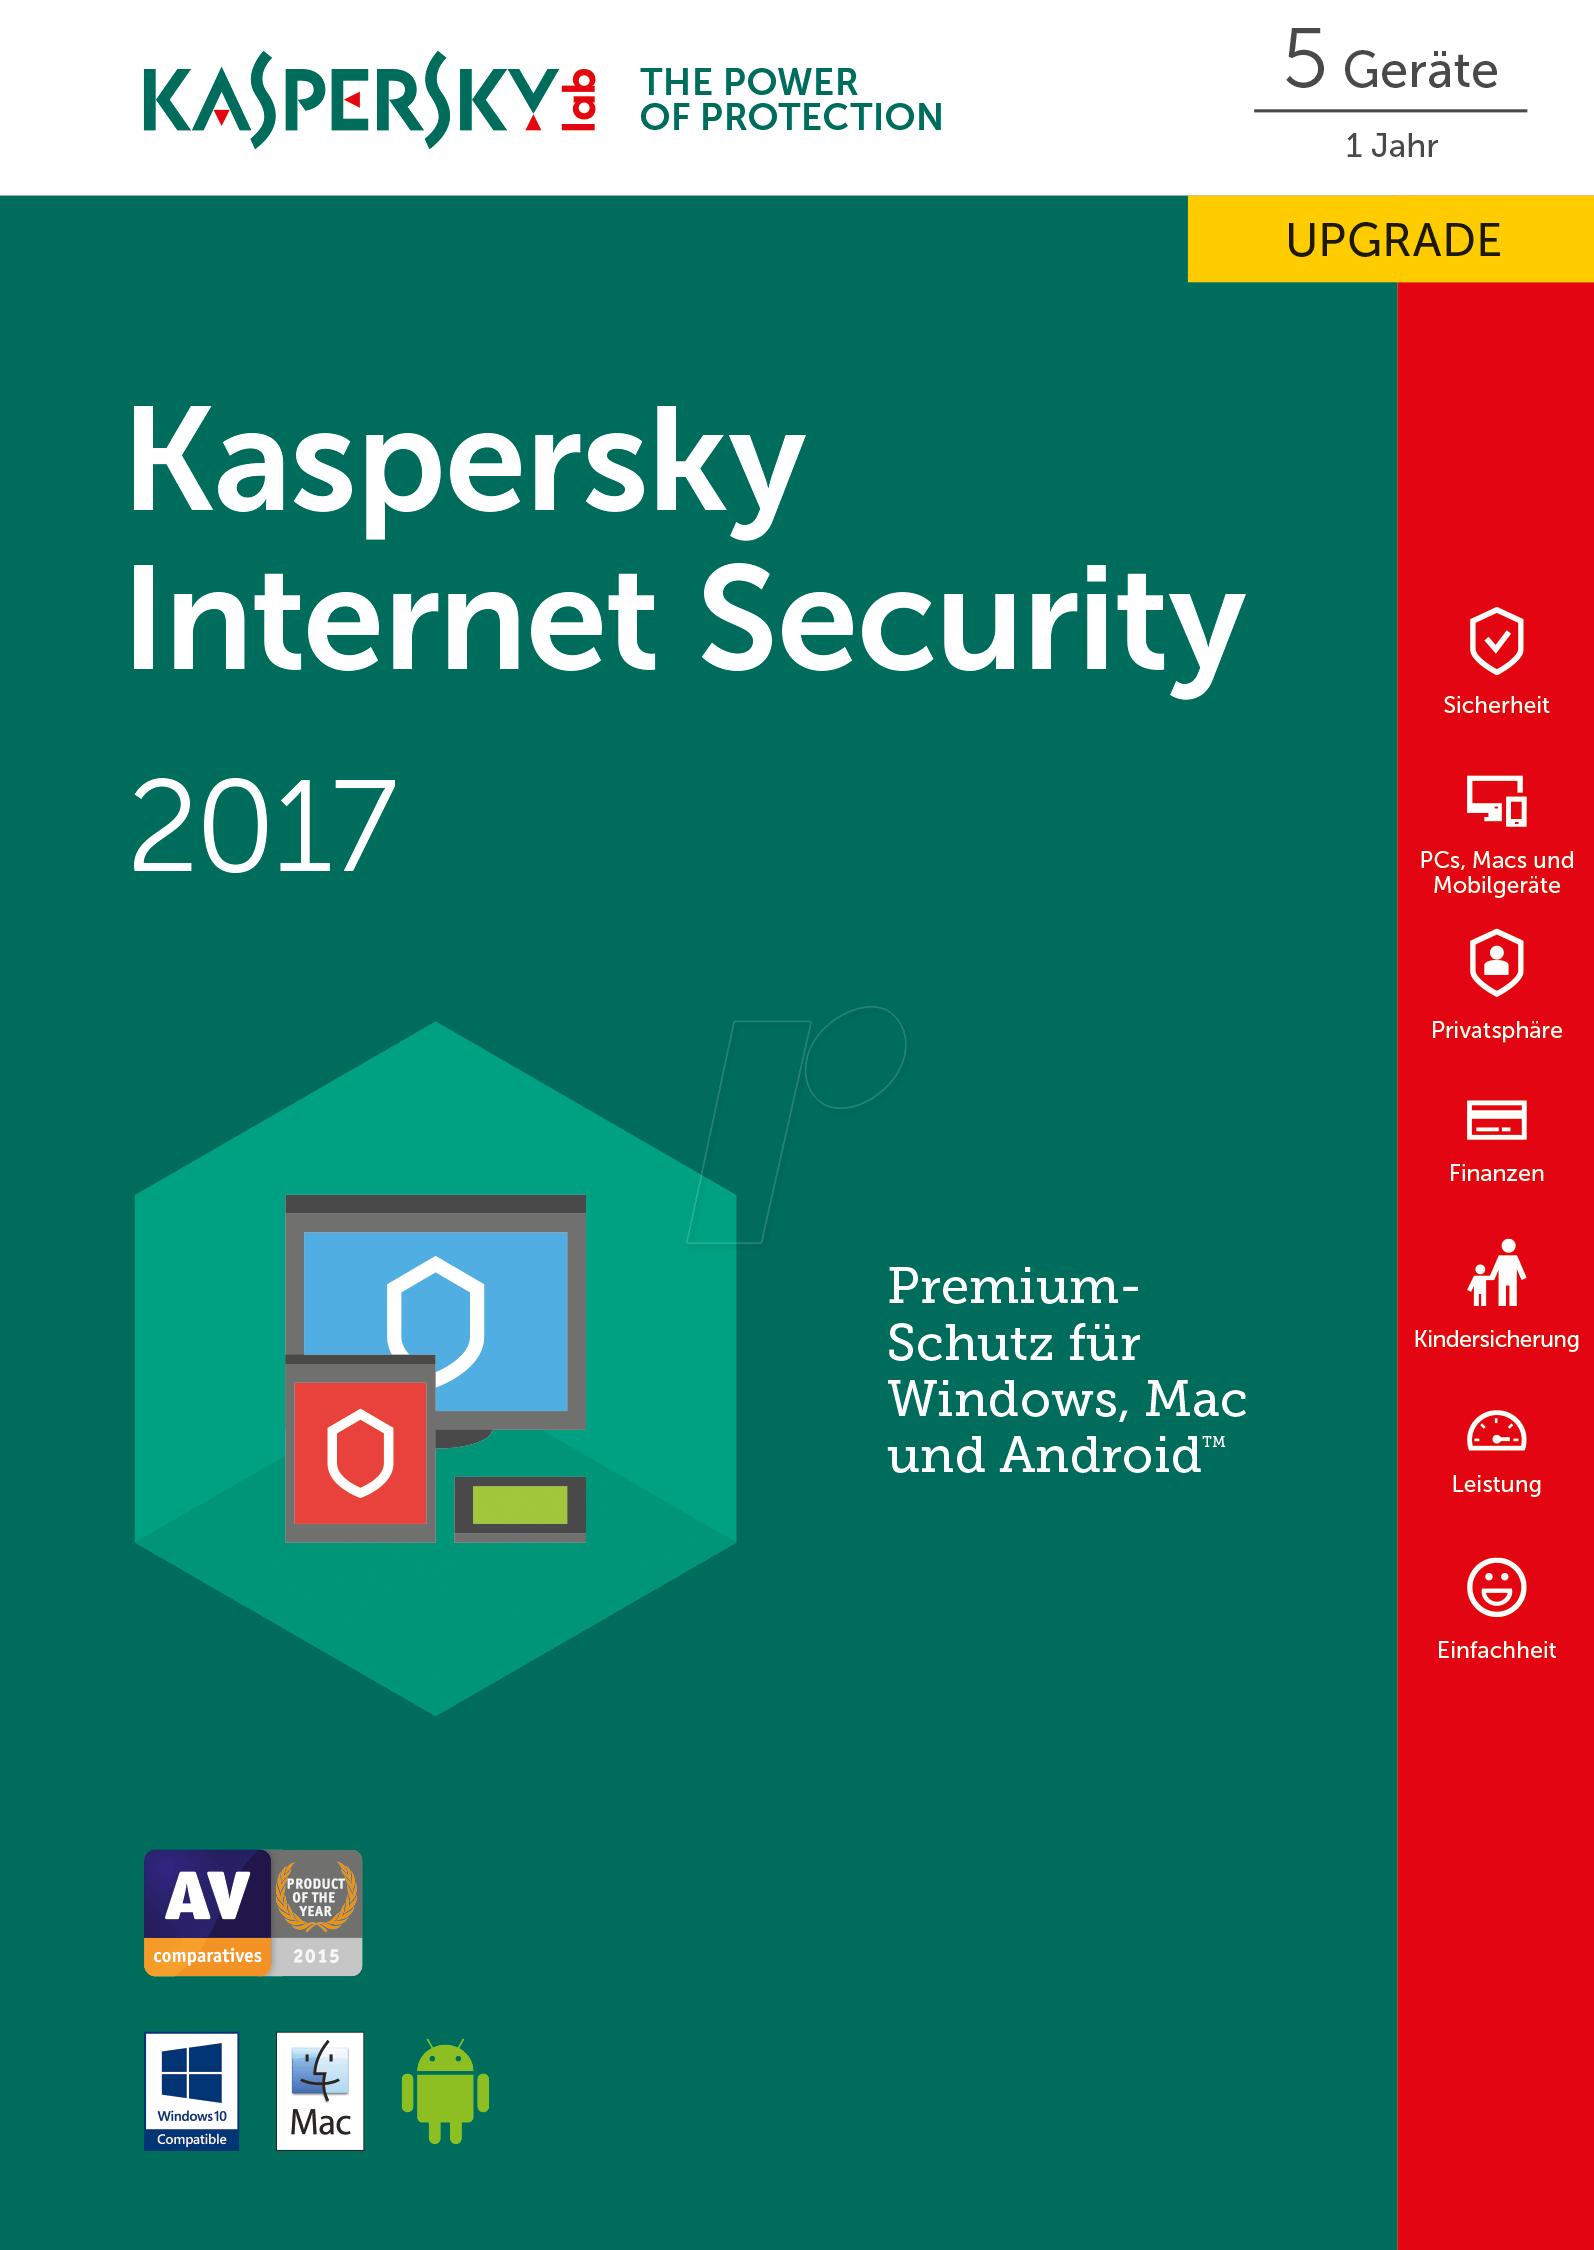 https://cdn-reichelt.de/bilder/web/xxl_ws/G500/KASPERSKY_IS2017_5U_UPG_02.png